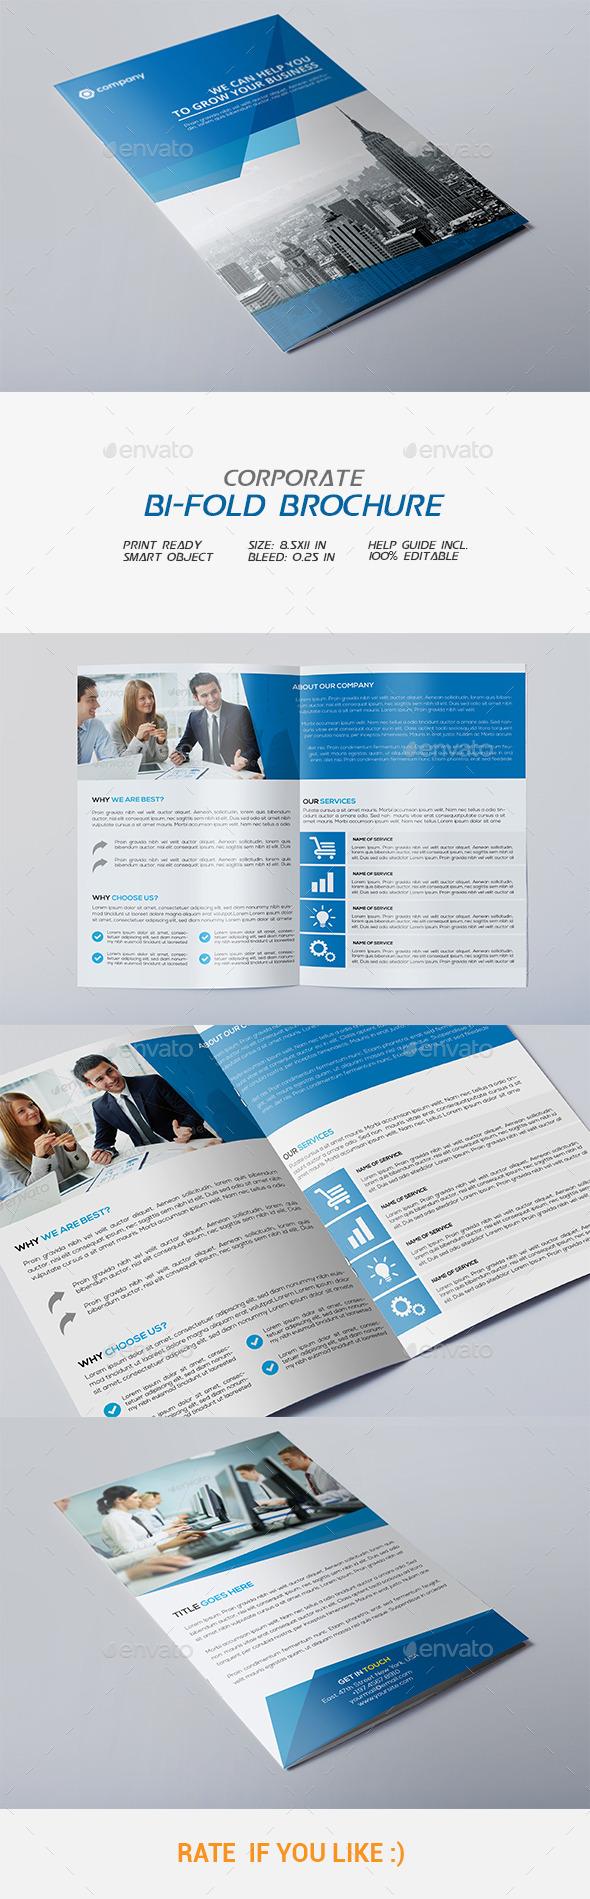 GraphicRiver Corporate Bi-fold Brochure 11921215